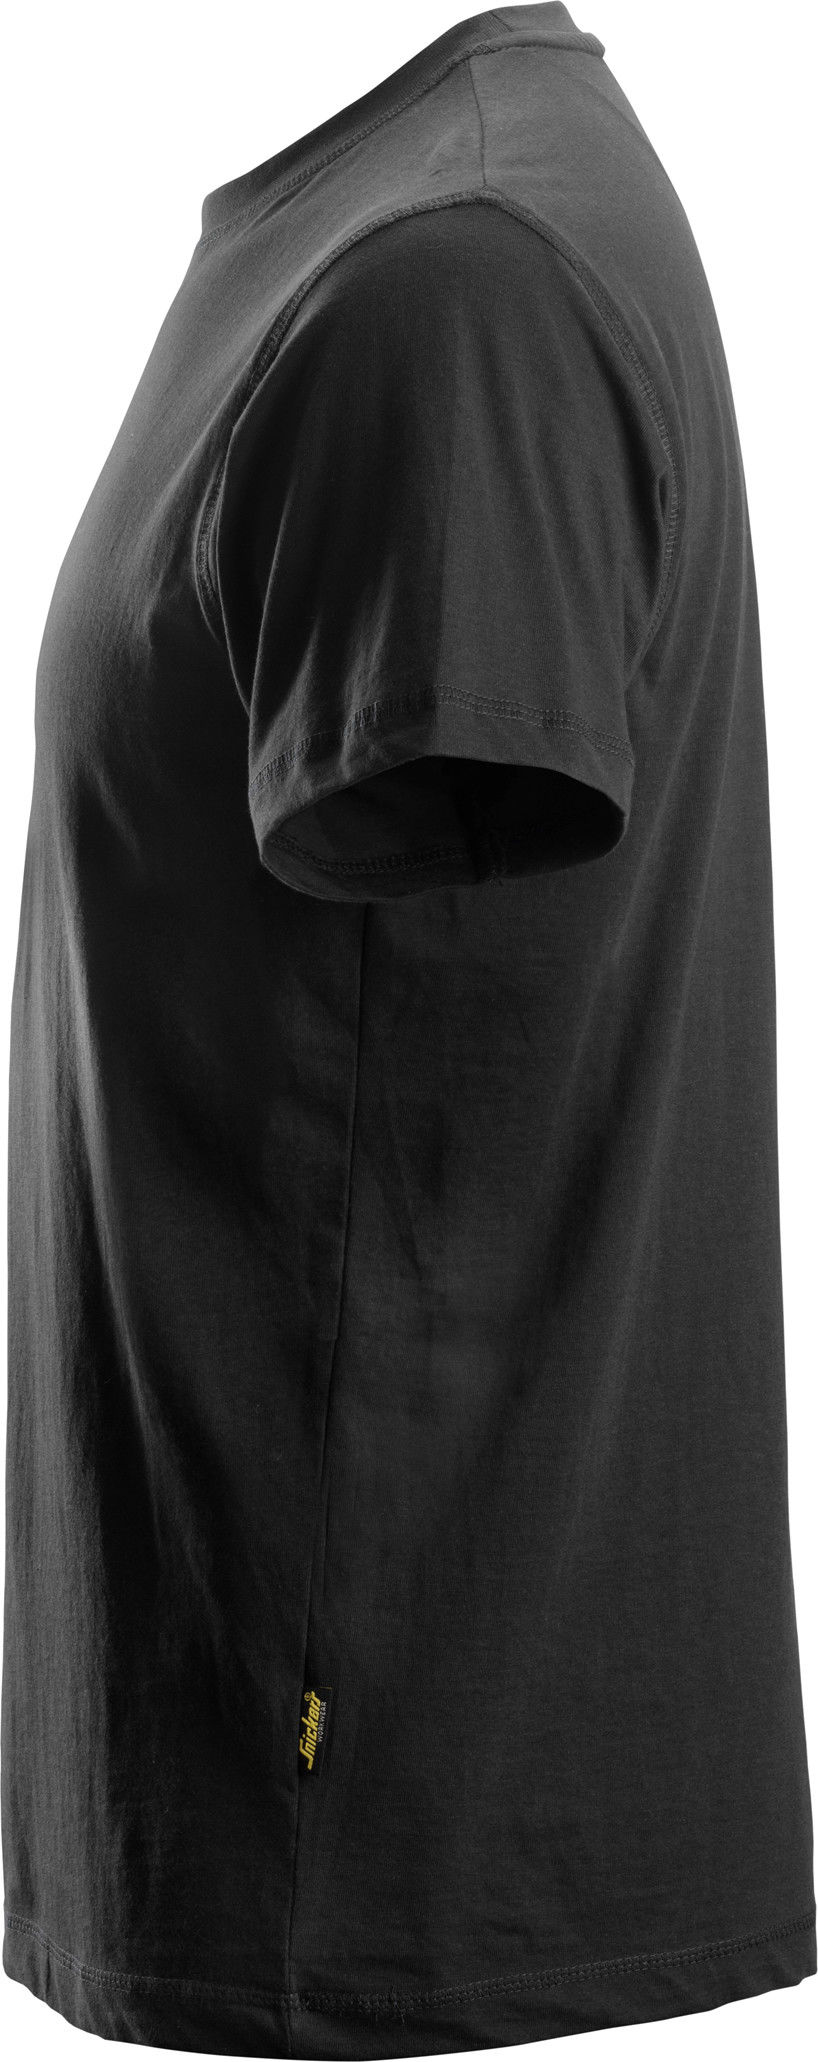 T-shirt koszulka męska, czarna, rozmiar S, 2502 Snickers [25020400004]